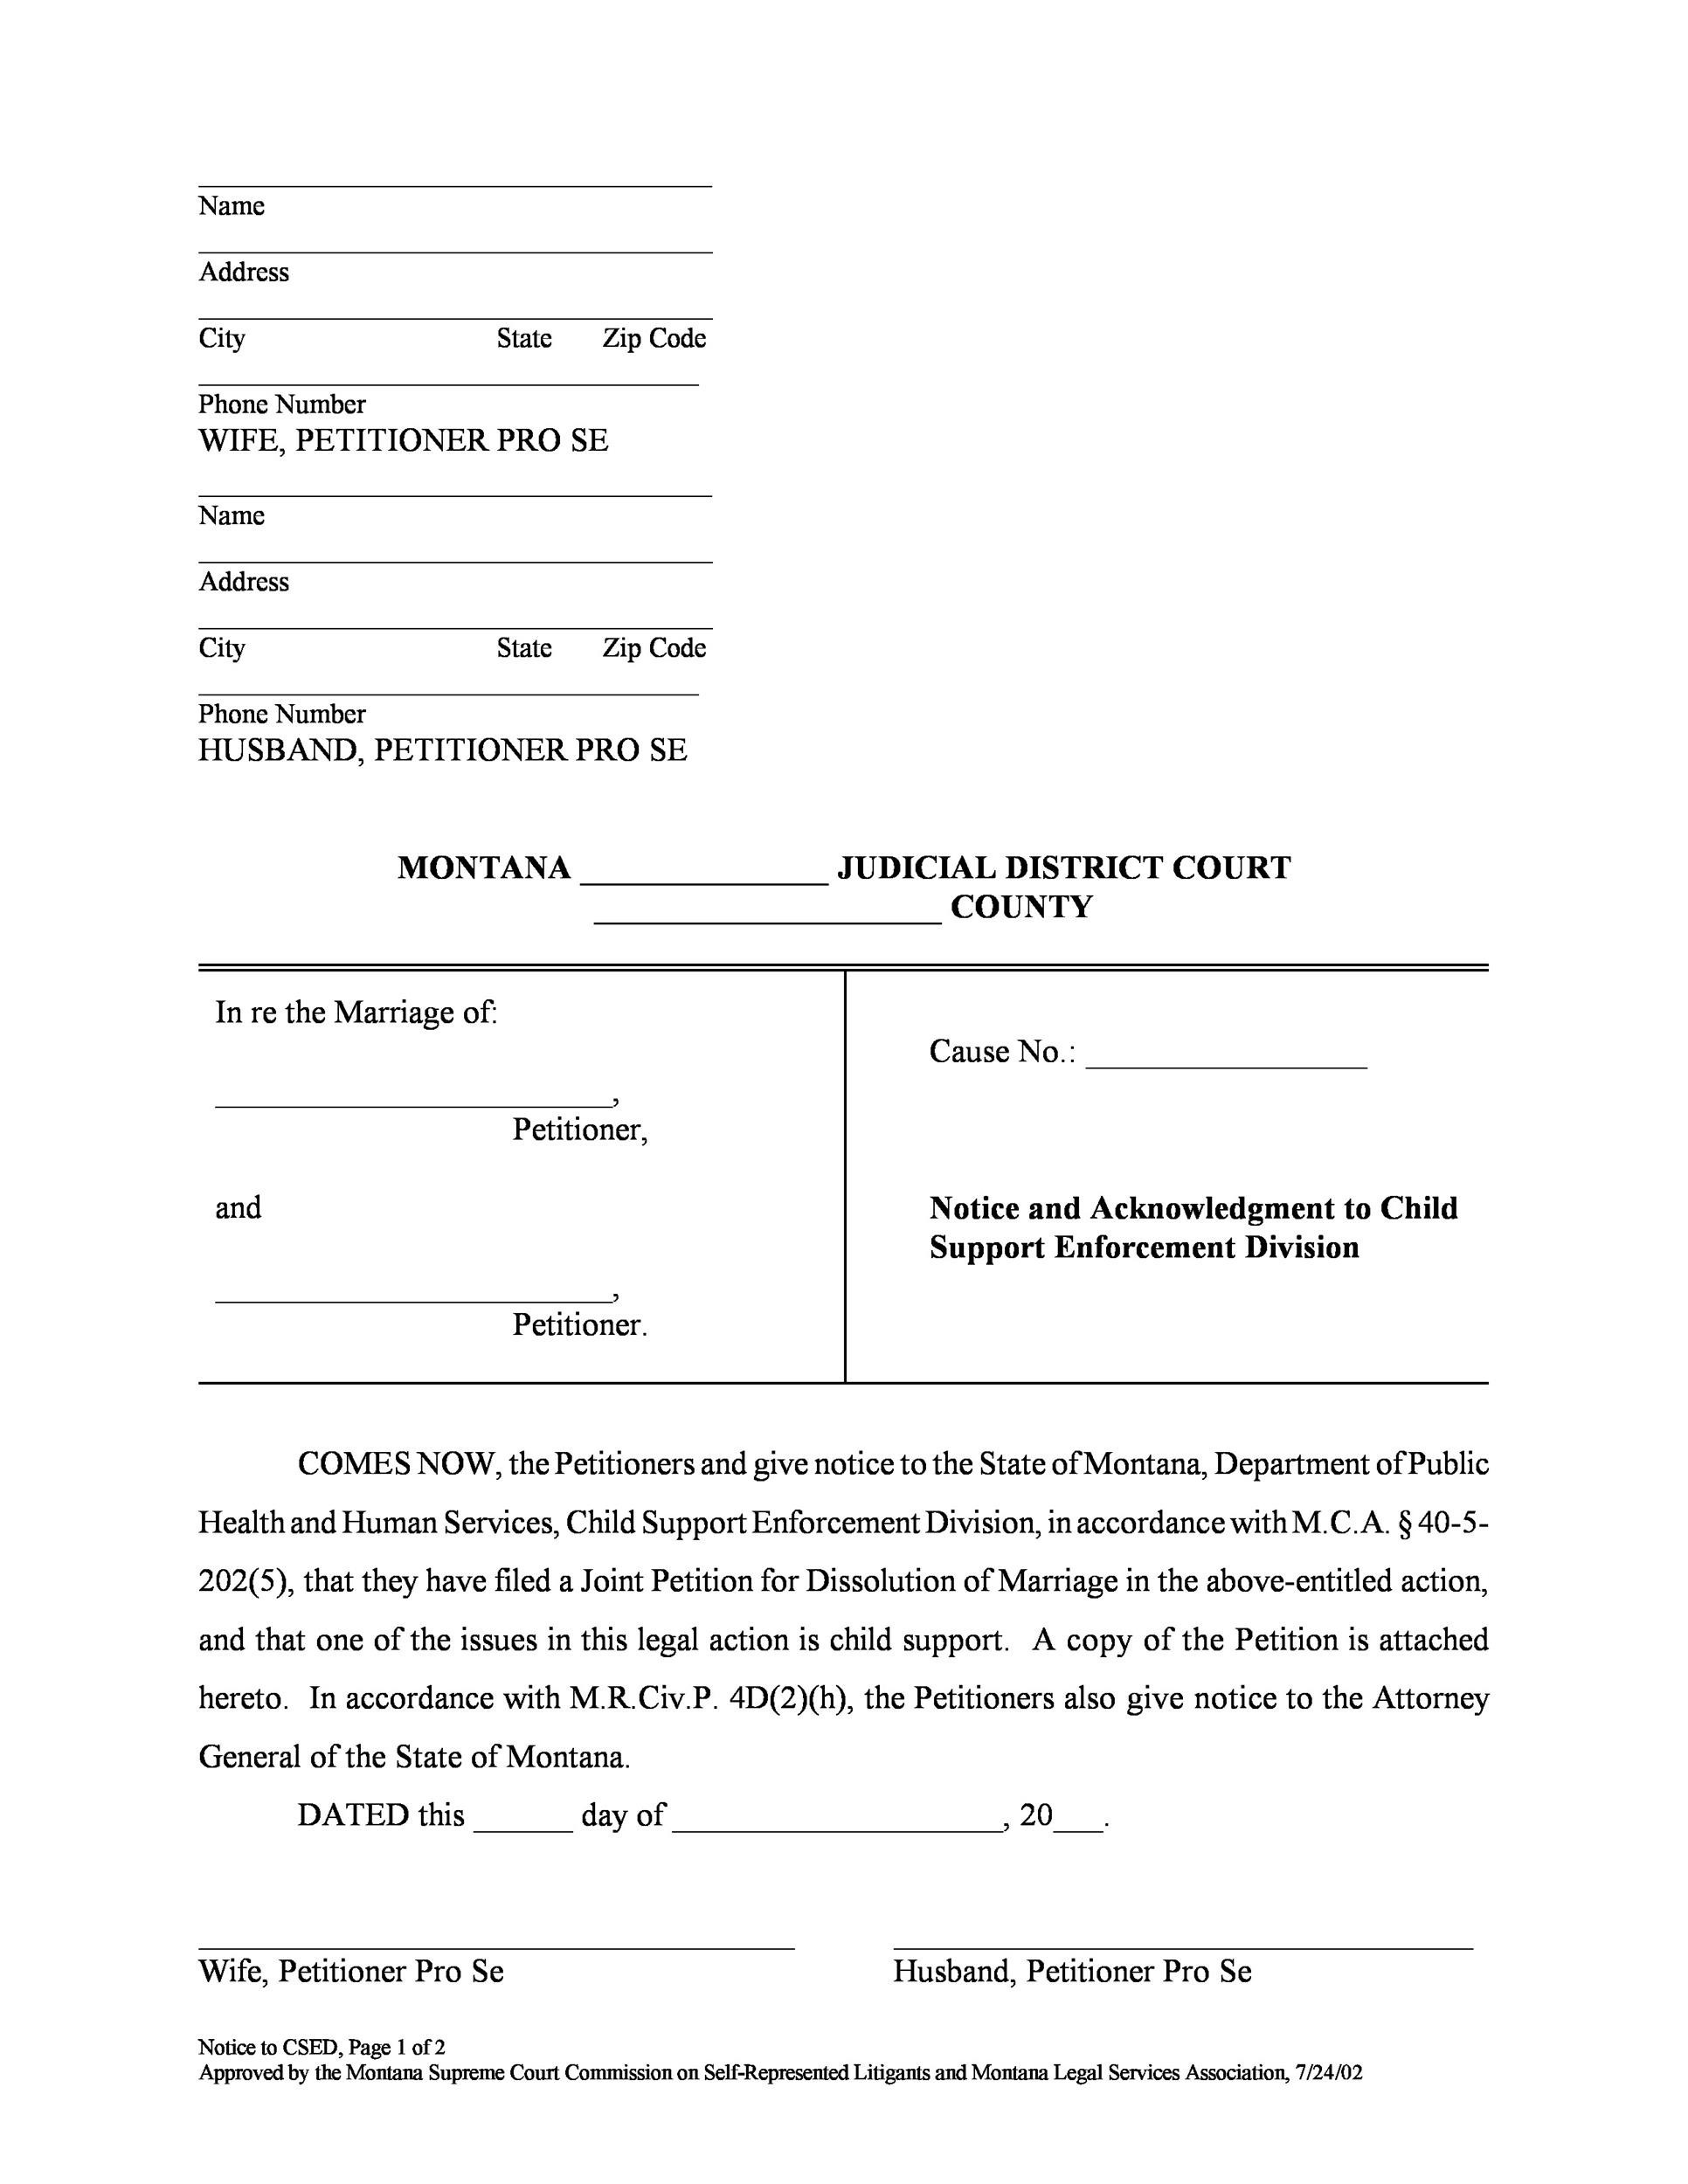 40 Free Divorce Papers (Printable) - Template Lab - free printable fake divorce papers